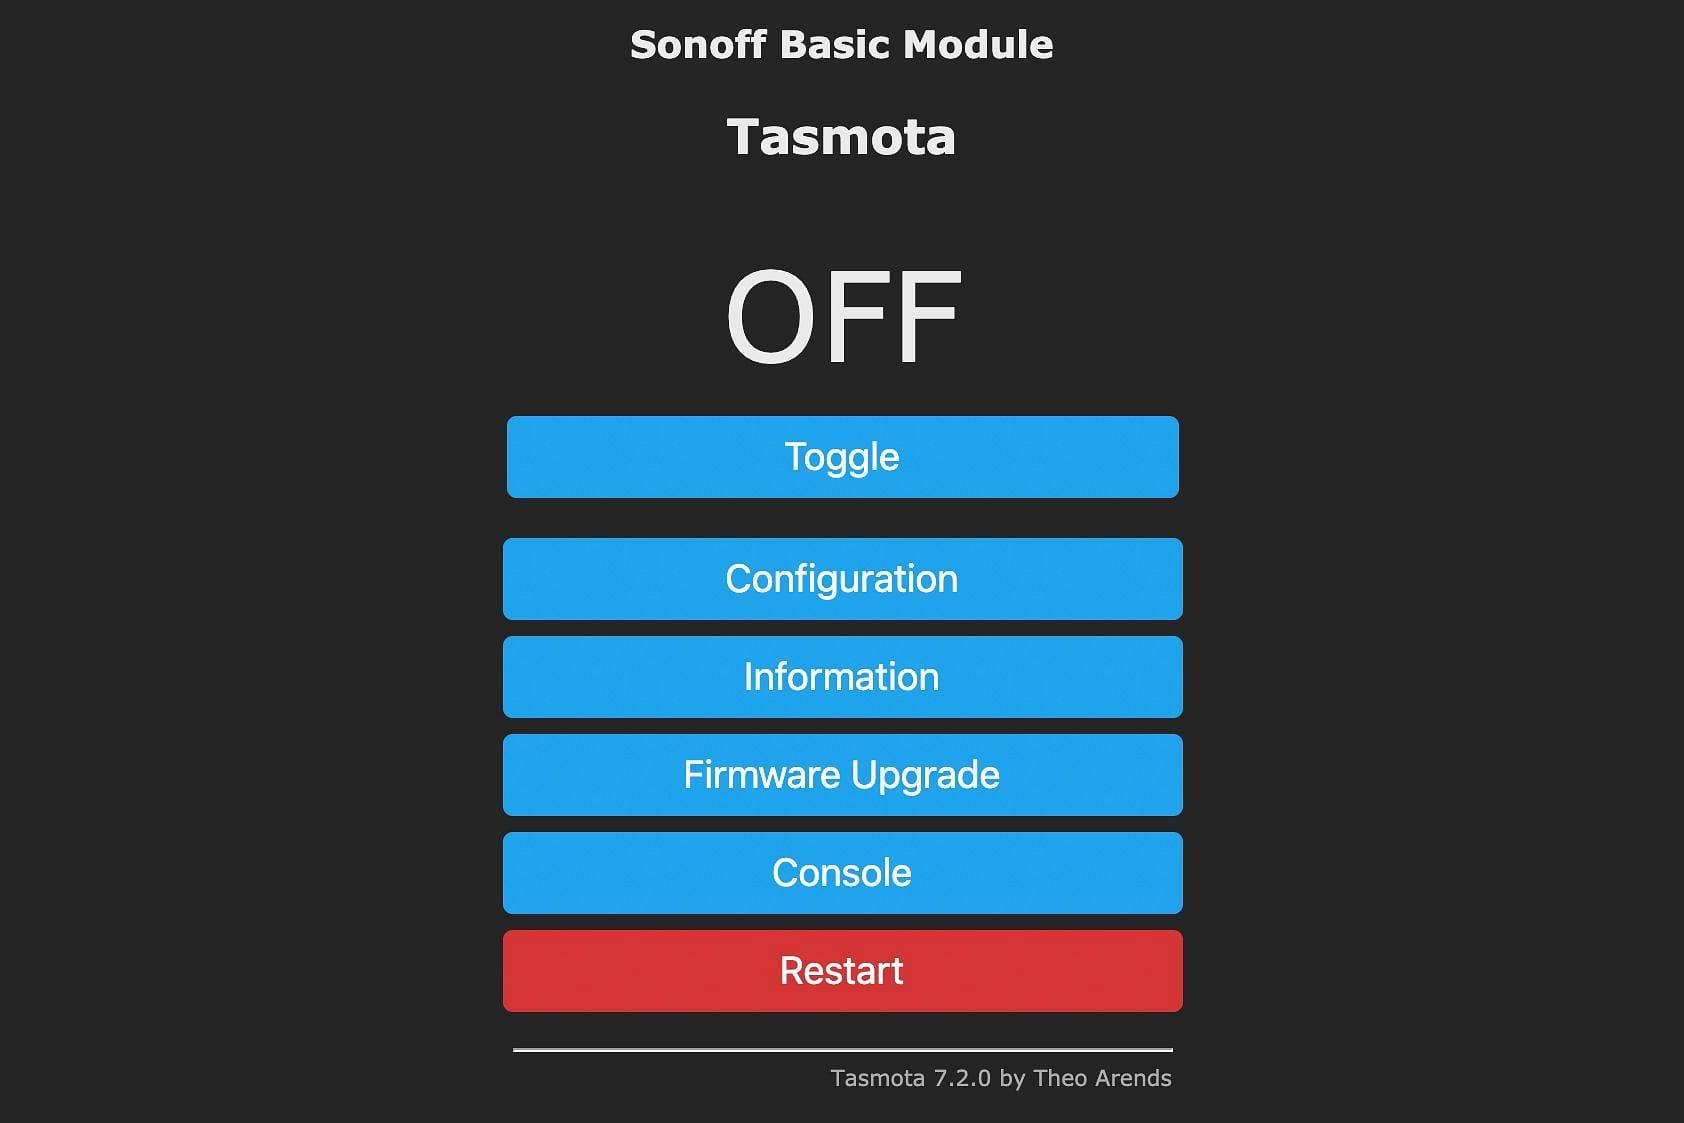 Tasmota Sonoff Basic Module